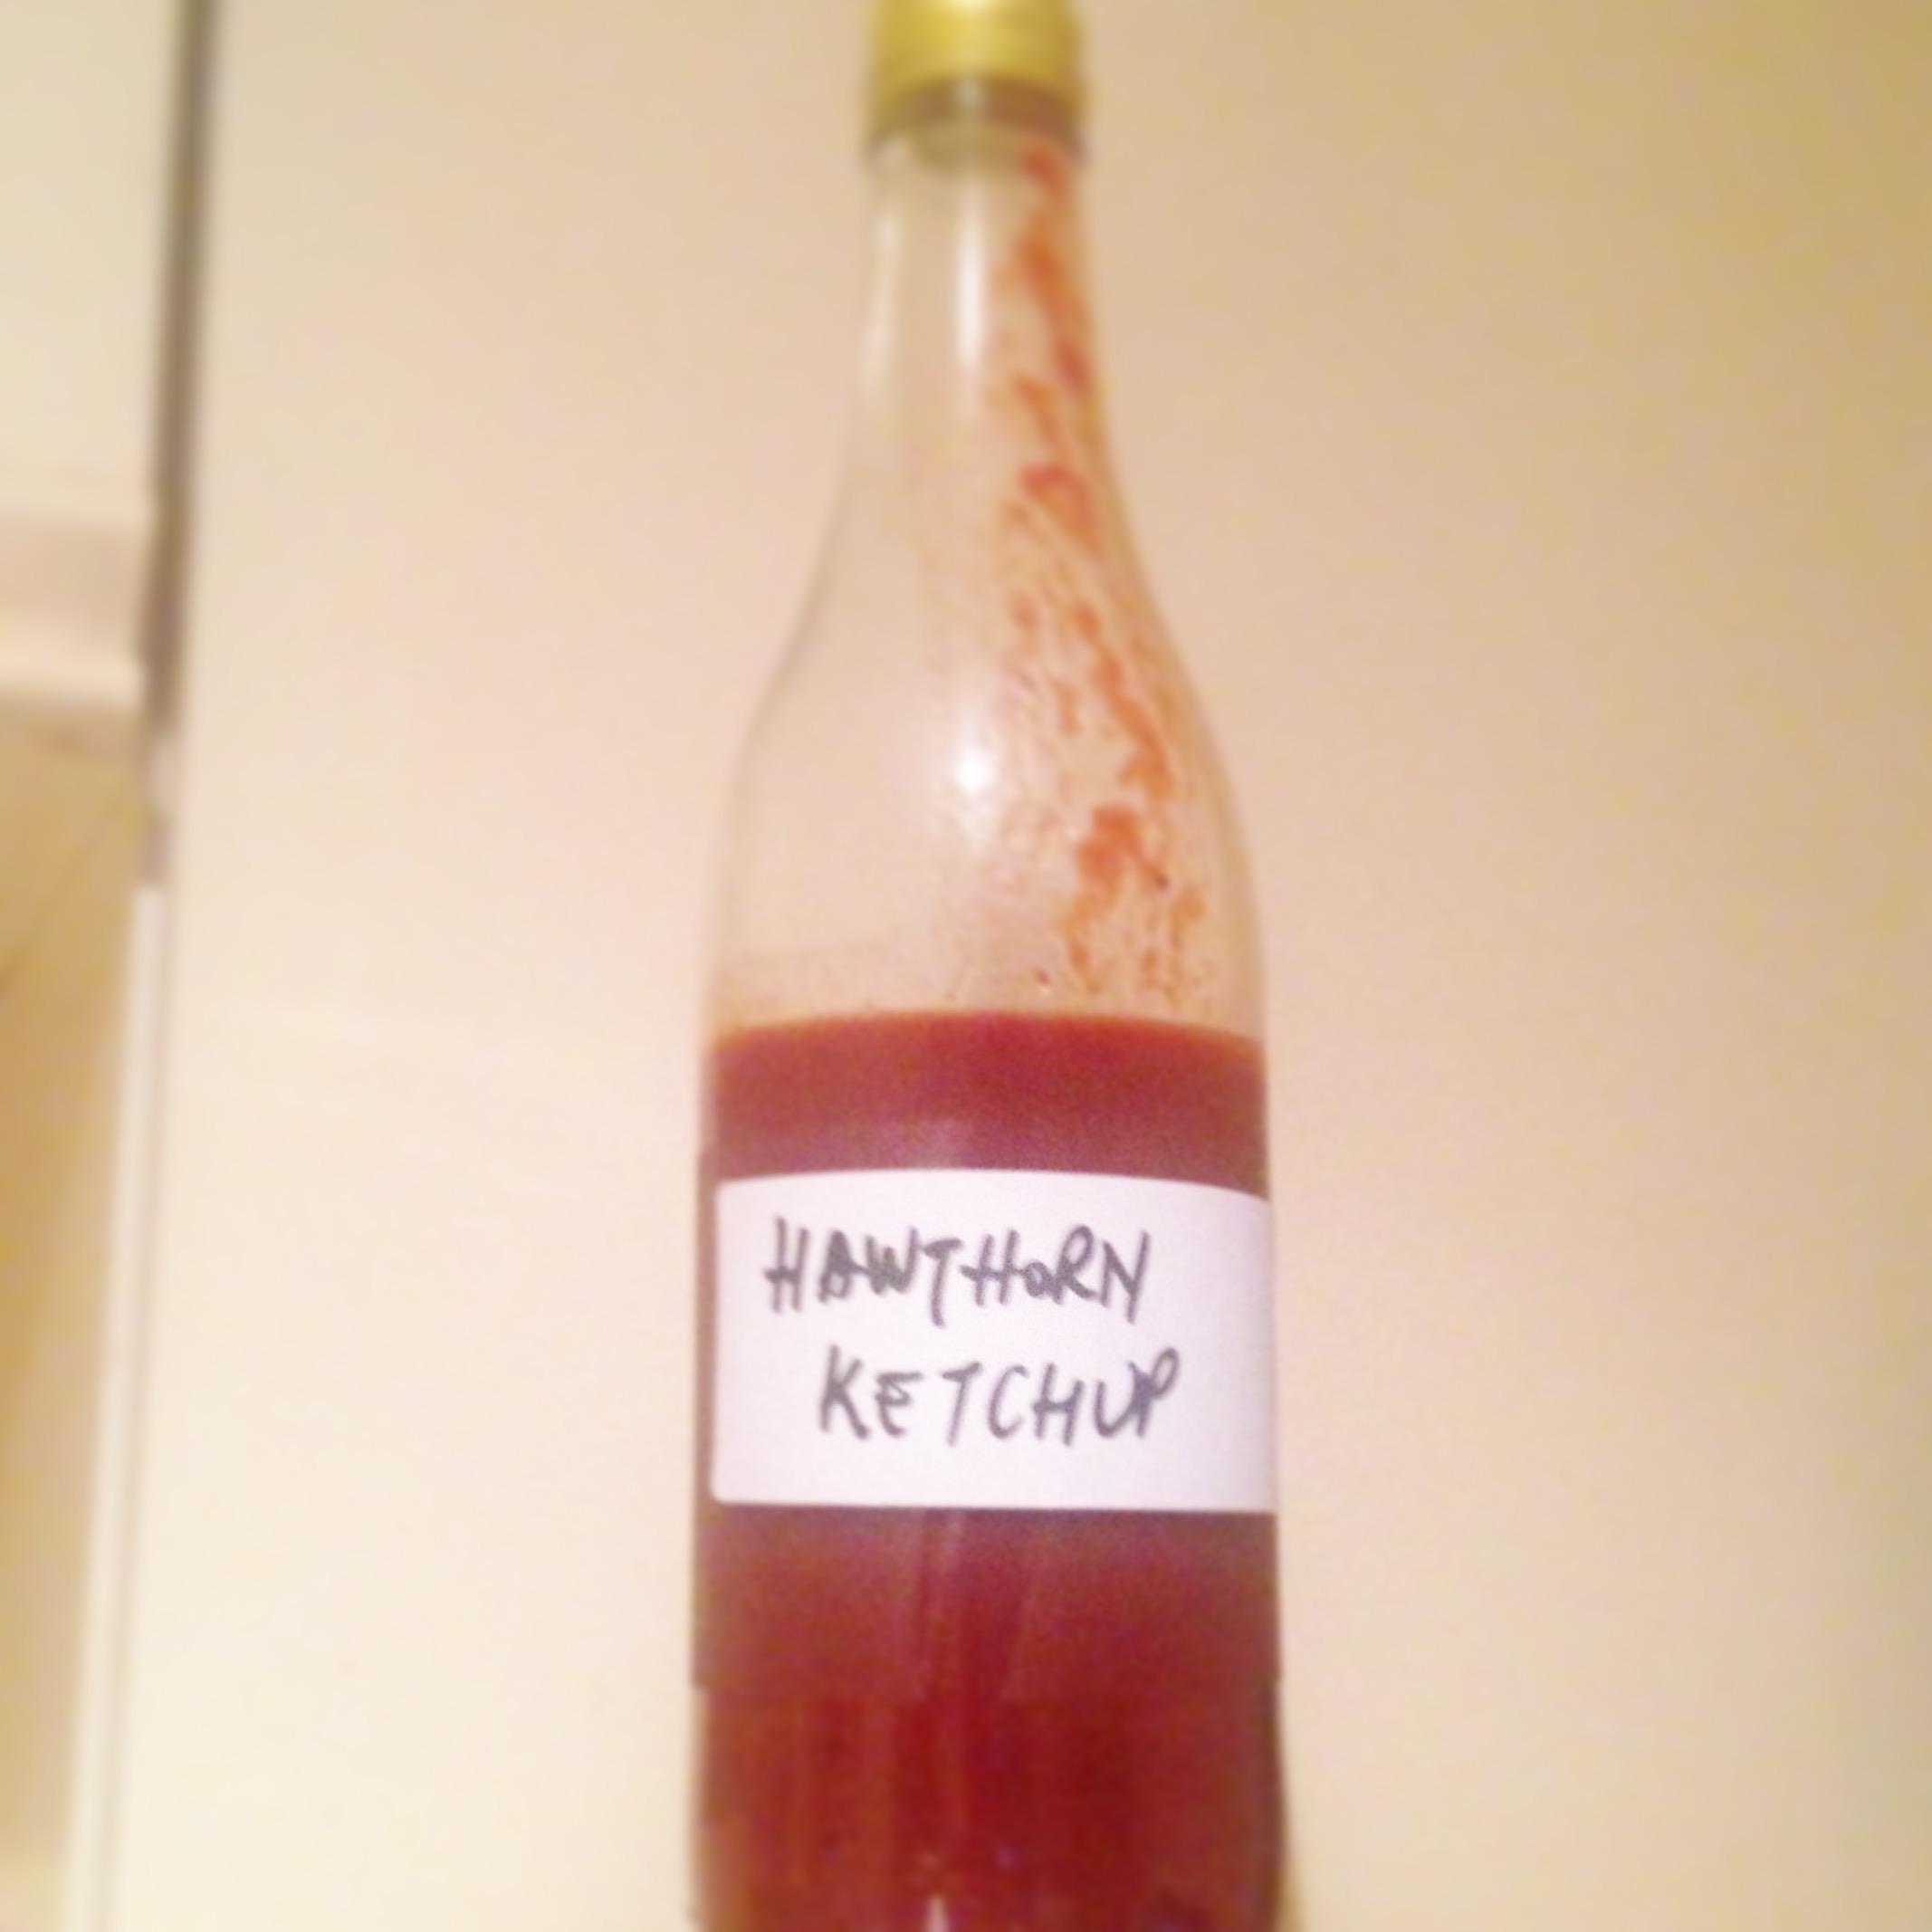 Hawthorn ketchup recipe Energya Ltd